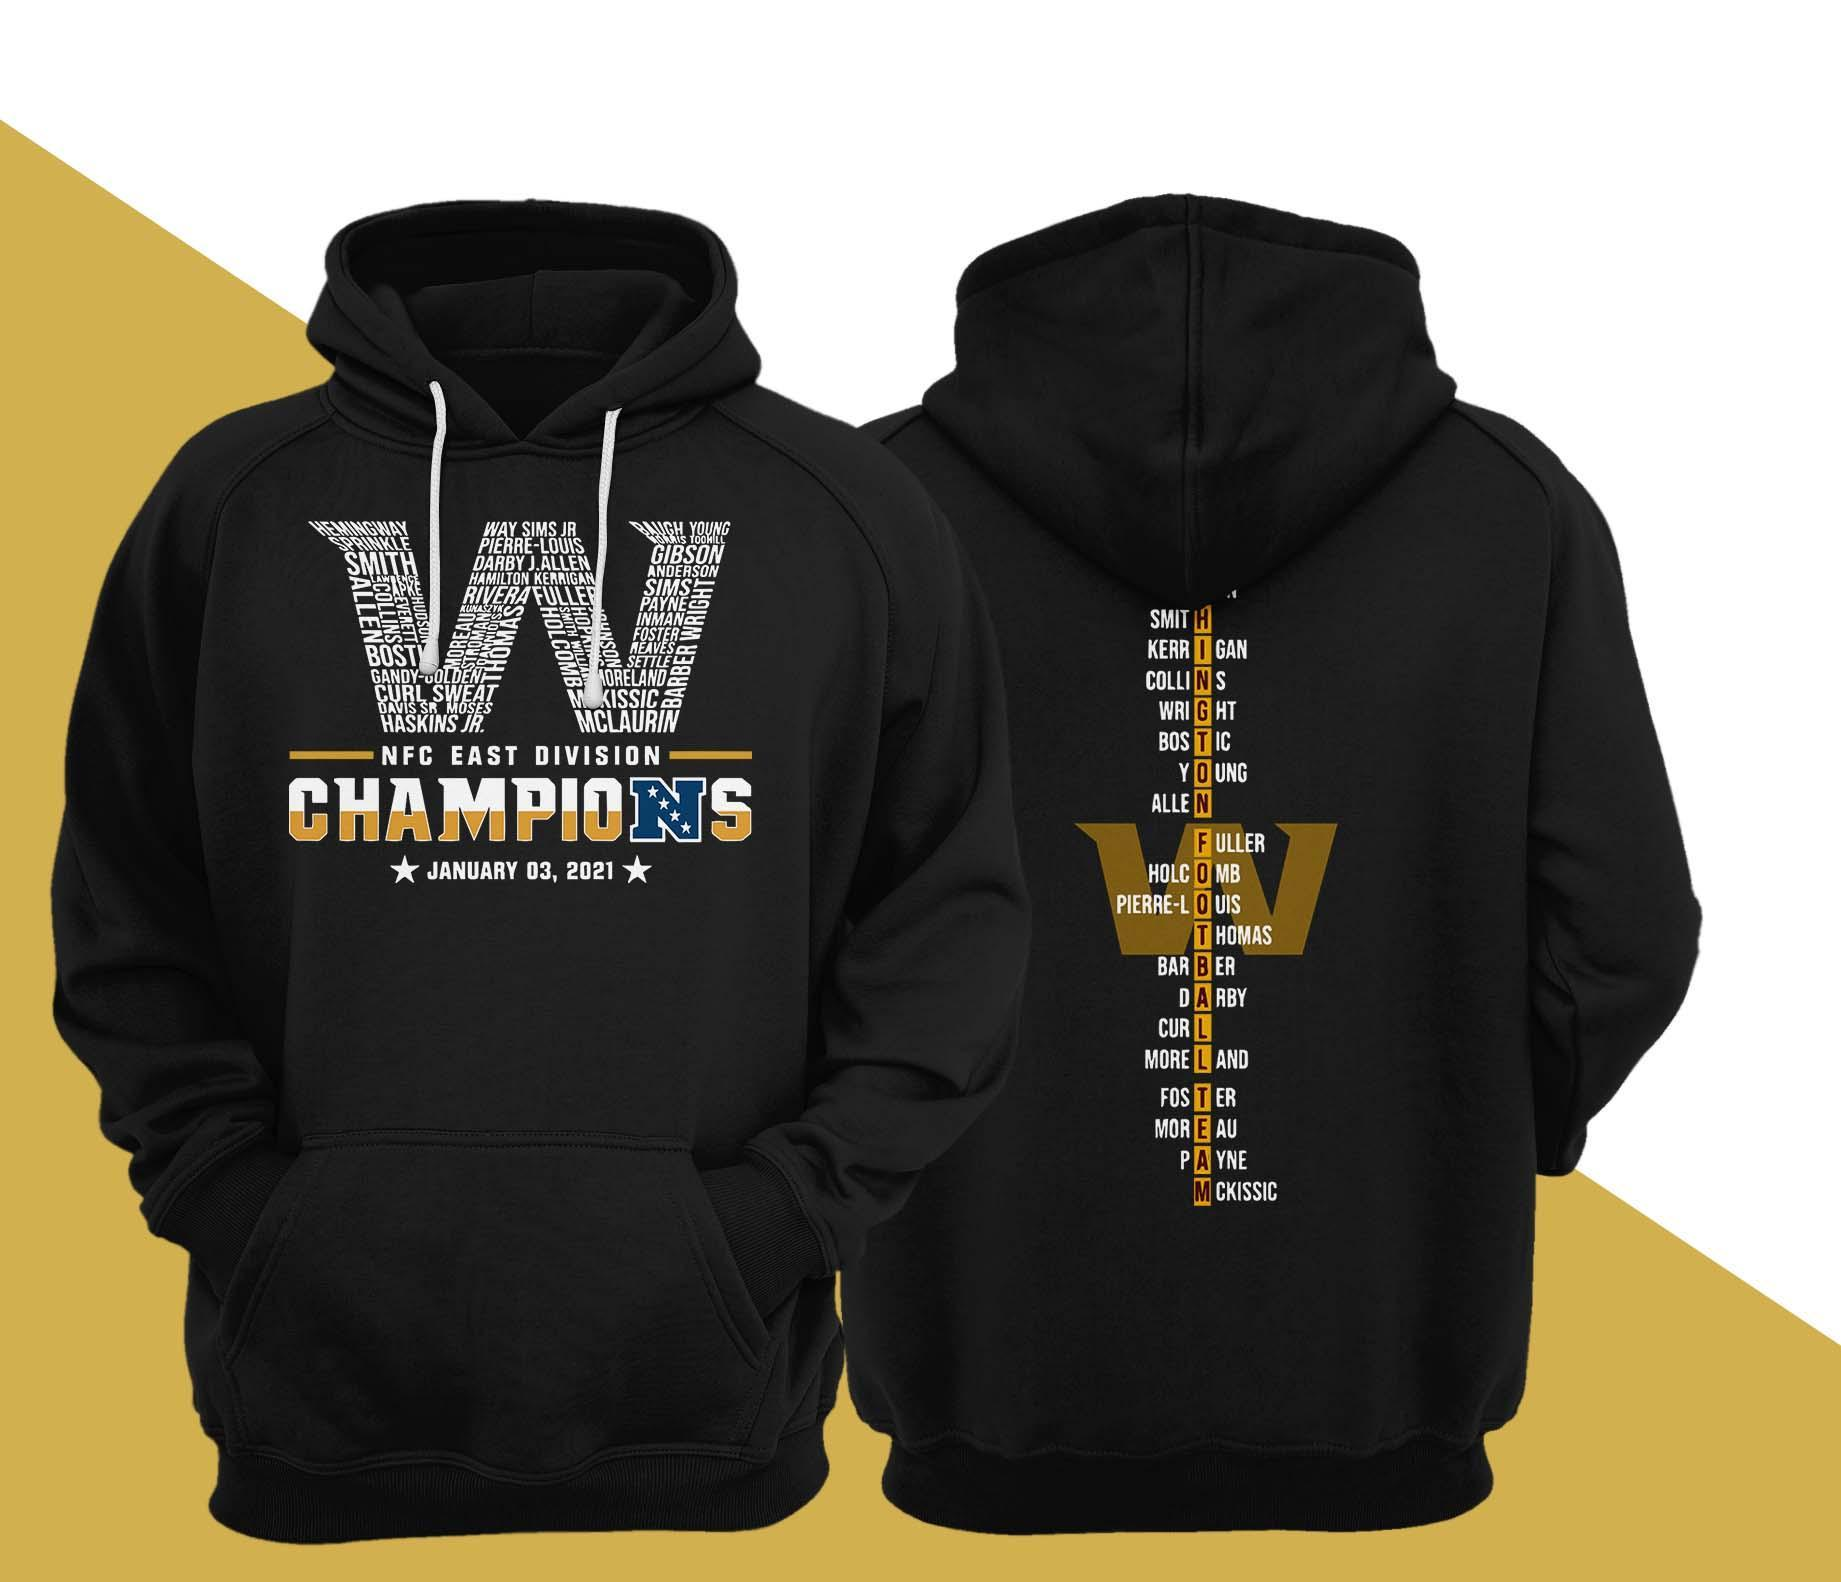 Washington Nfc East Division Champions January 03 2021 Hoodie